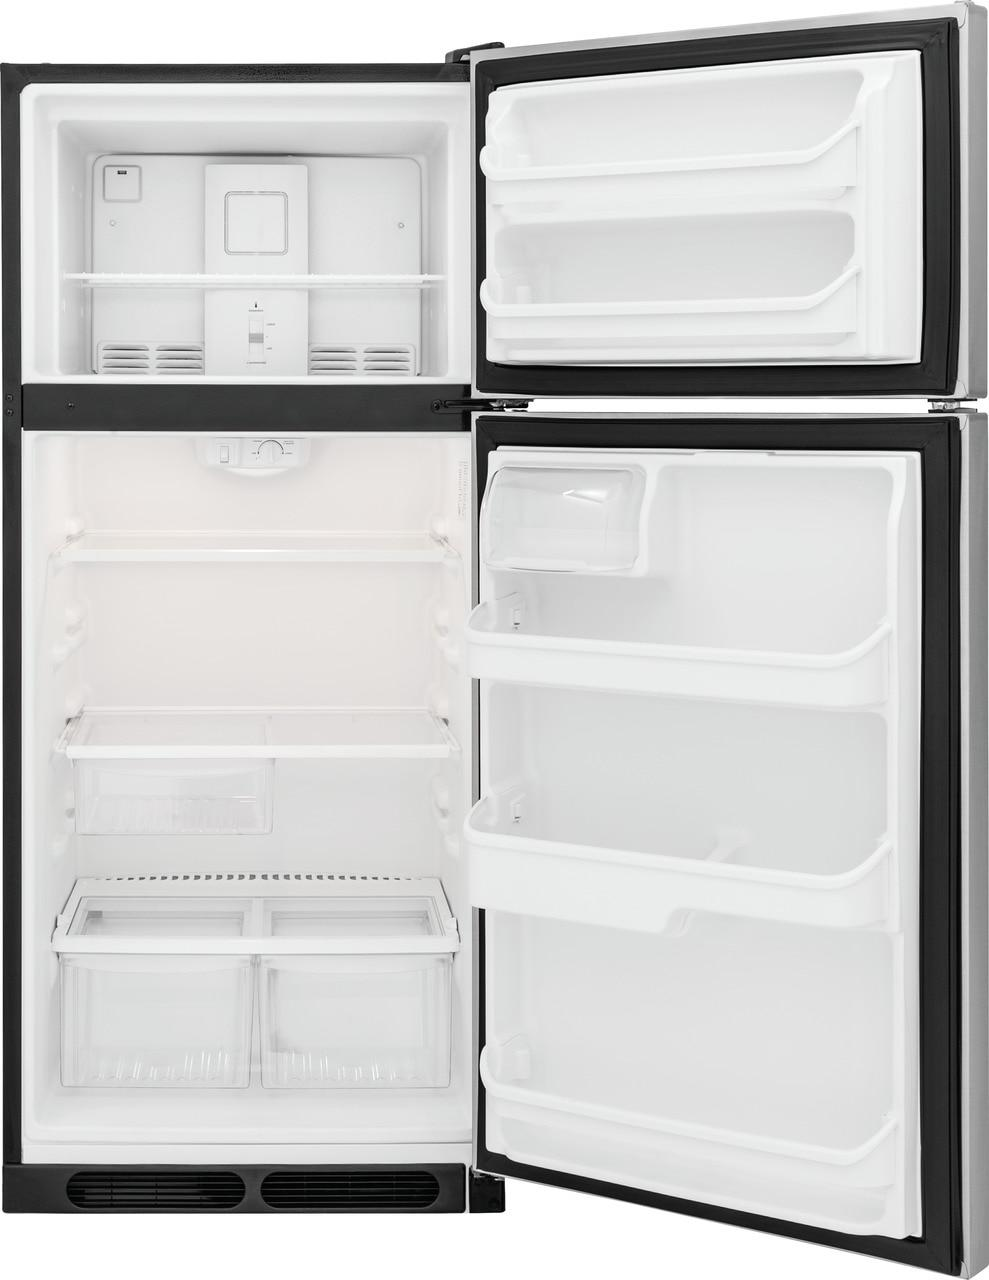 16.3 Cu. Ft. Top Freezer Refrigerator Photo #2